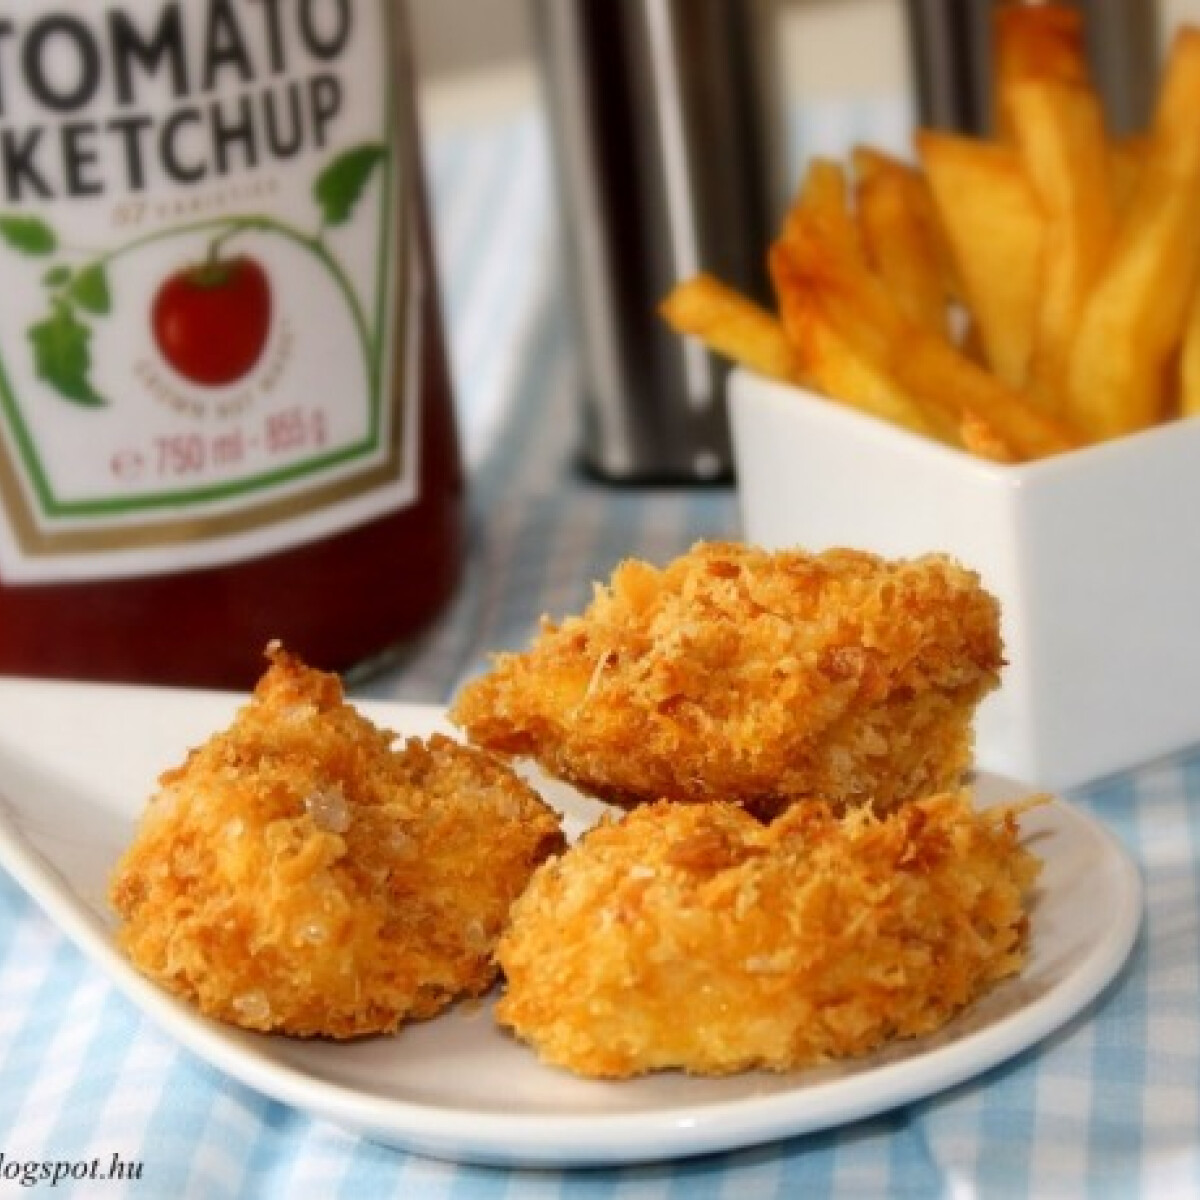 Ezen a képen: Panko chicken nuggets